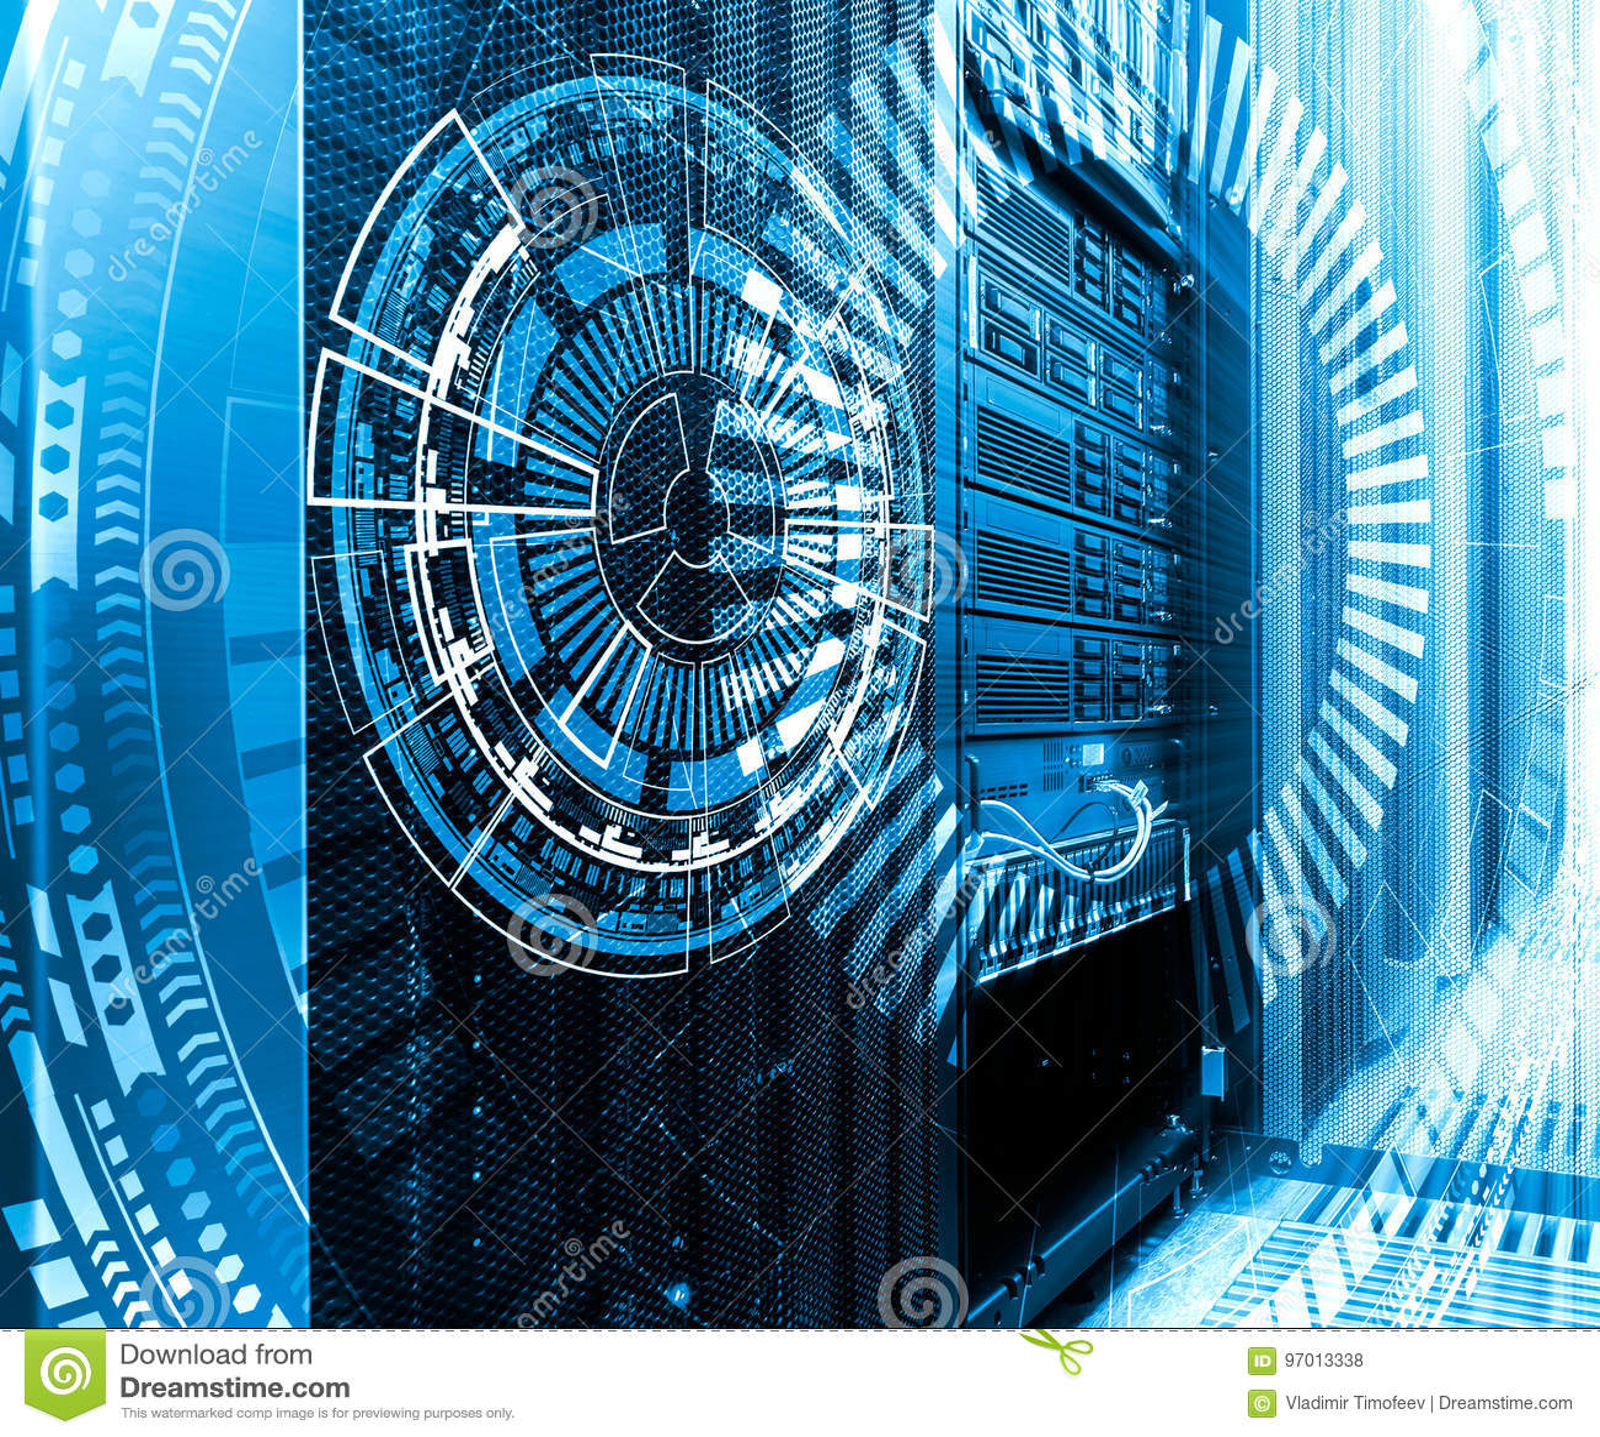 Teknologi-, cyberspace- och virtuell verklighetbegrepp - hologram med teknologisk bakgrund